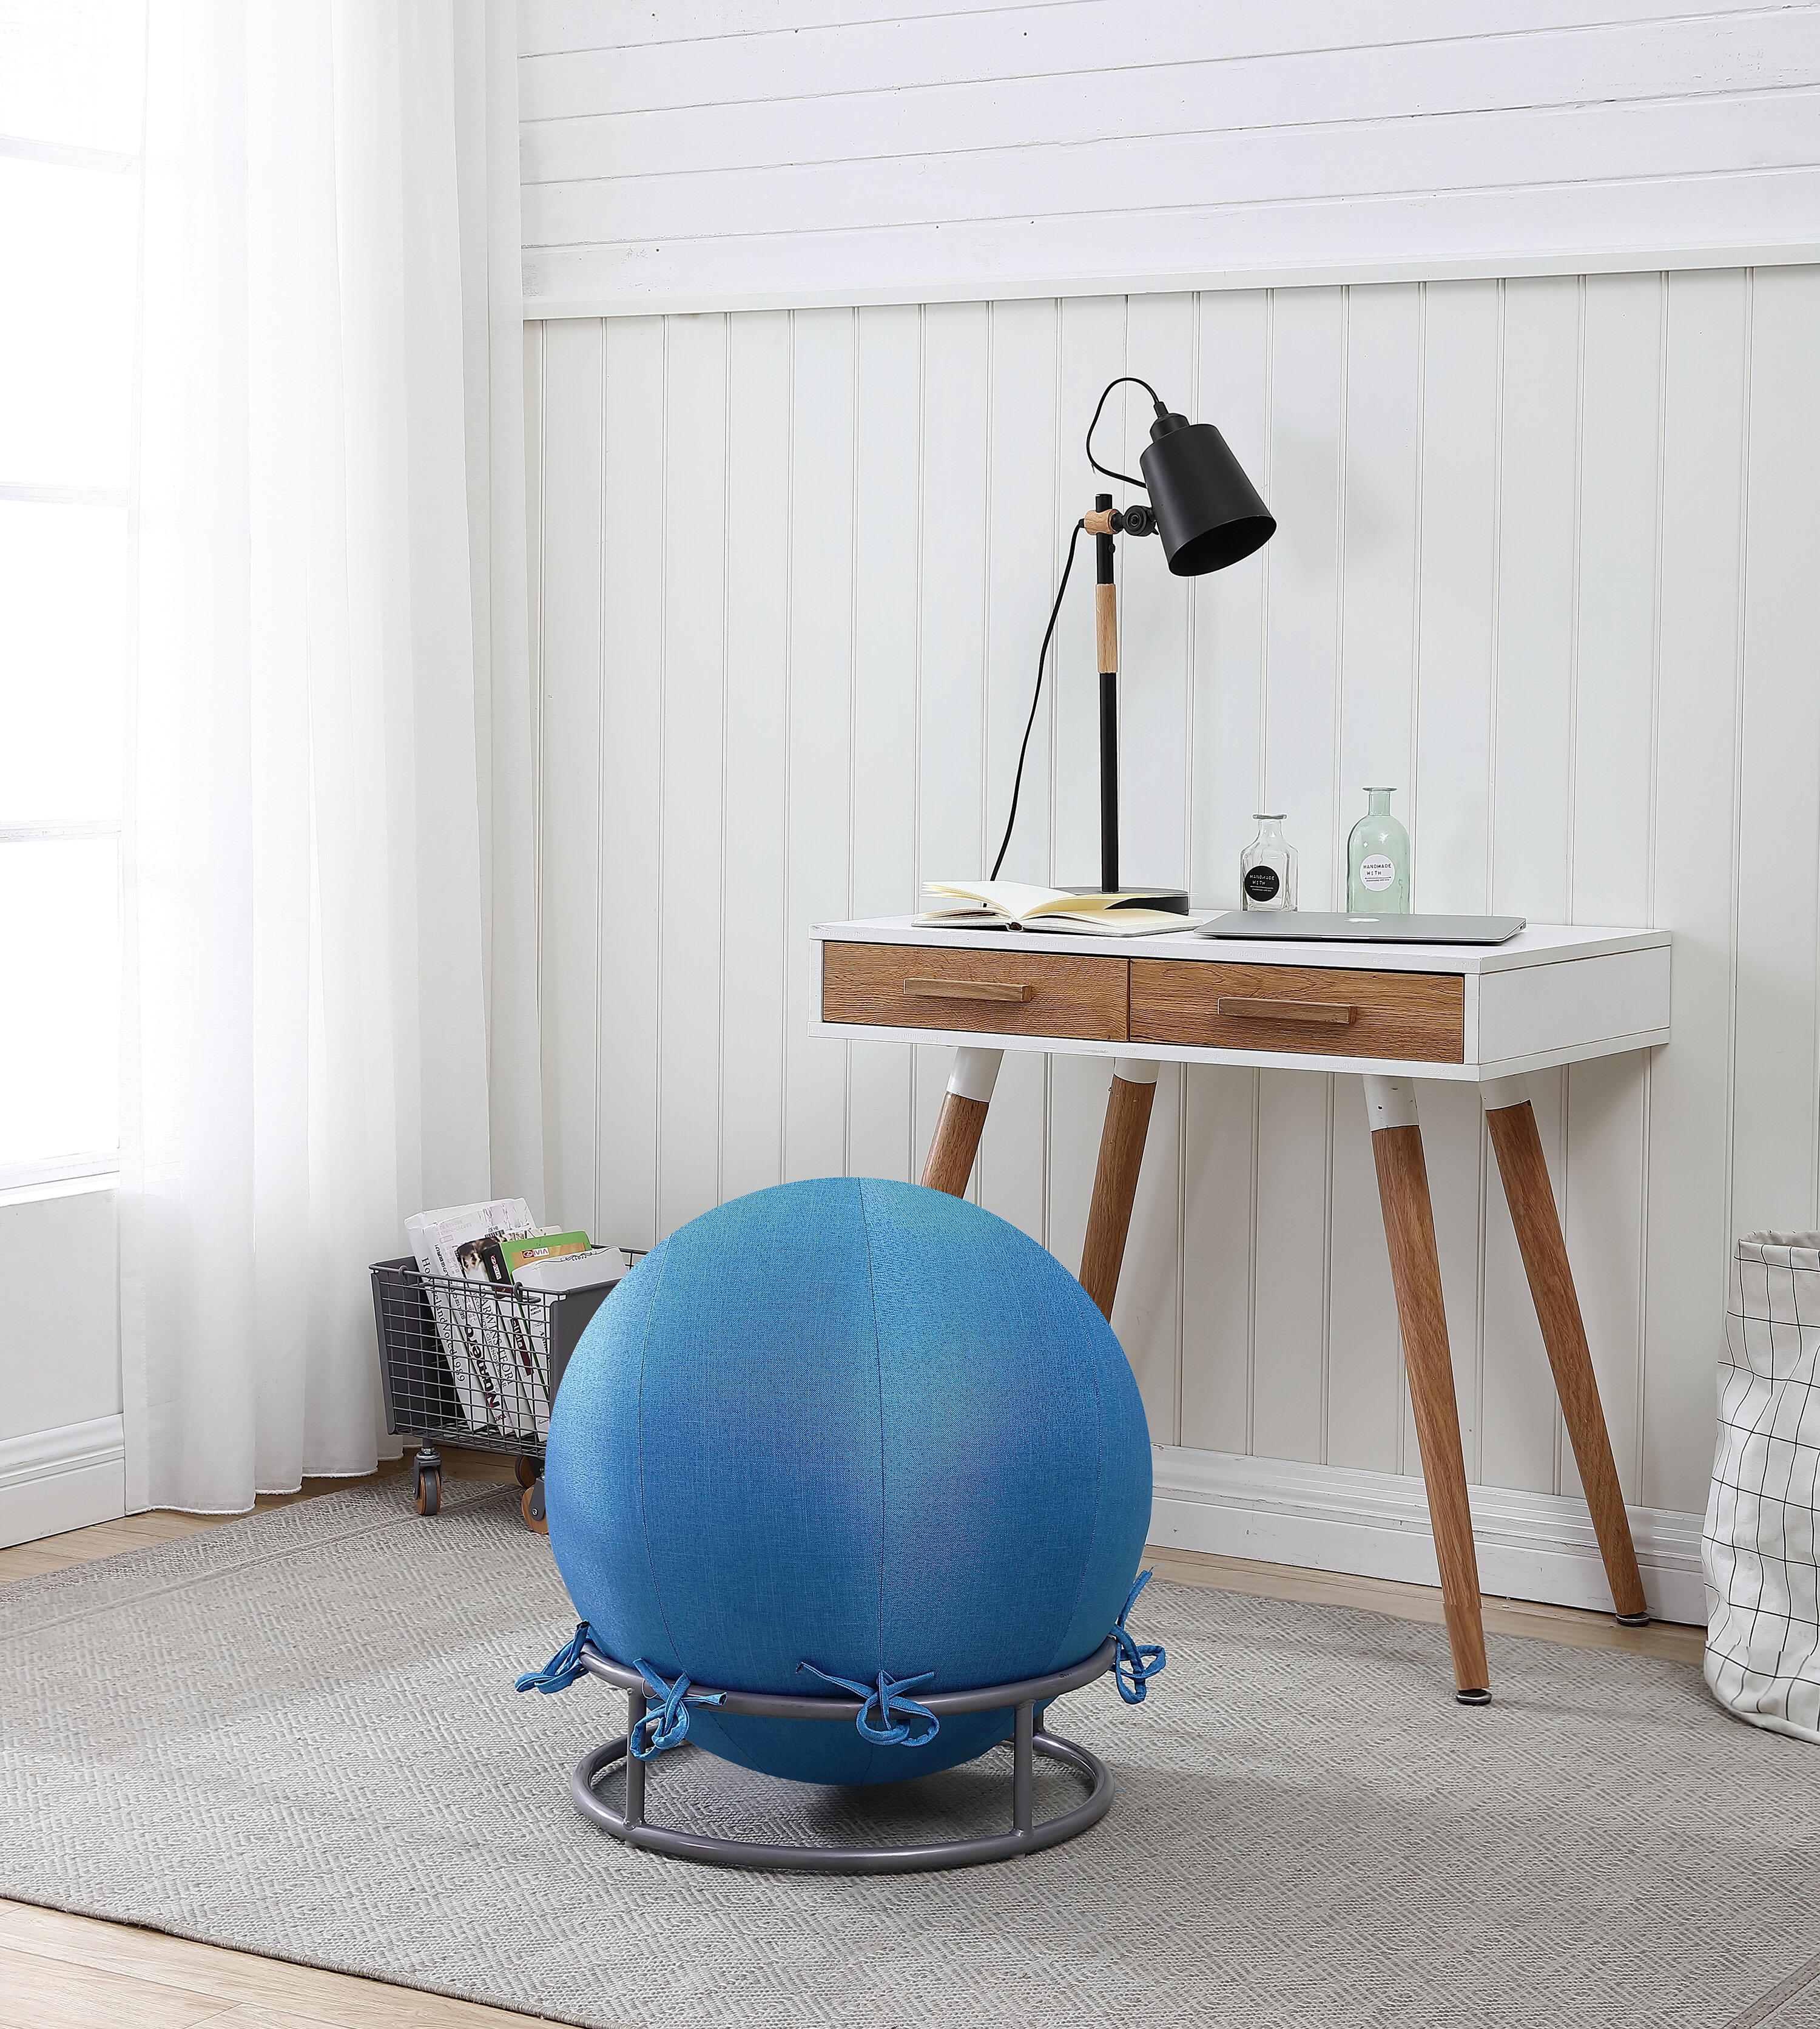 Symple Stuff Vickrey Yoga Ball Chair